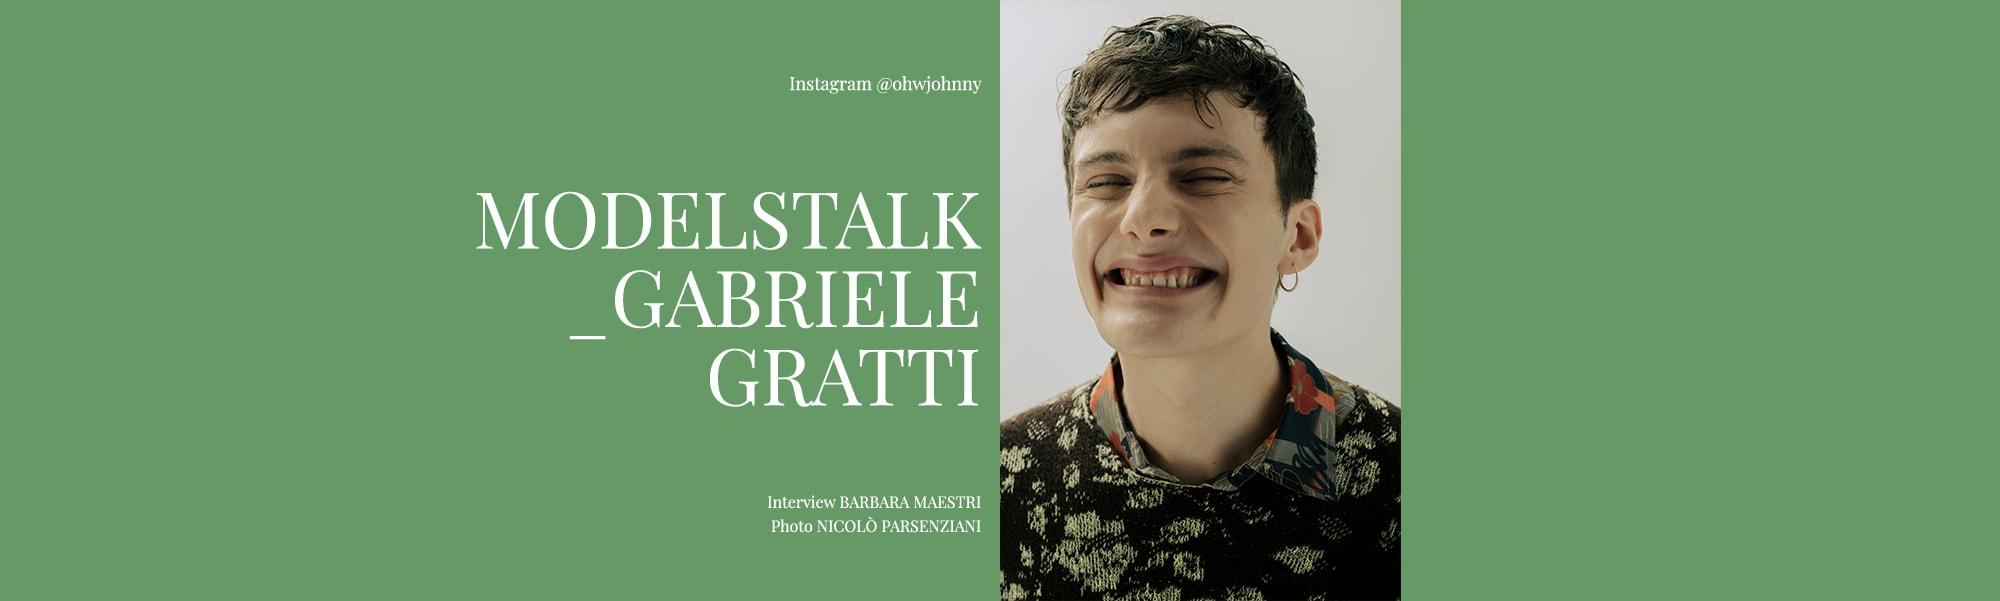 thegreatestmagazine-talking-heads-gabriele-gratti-01